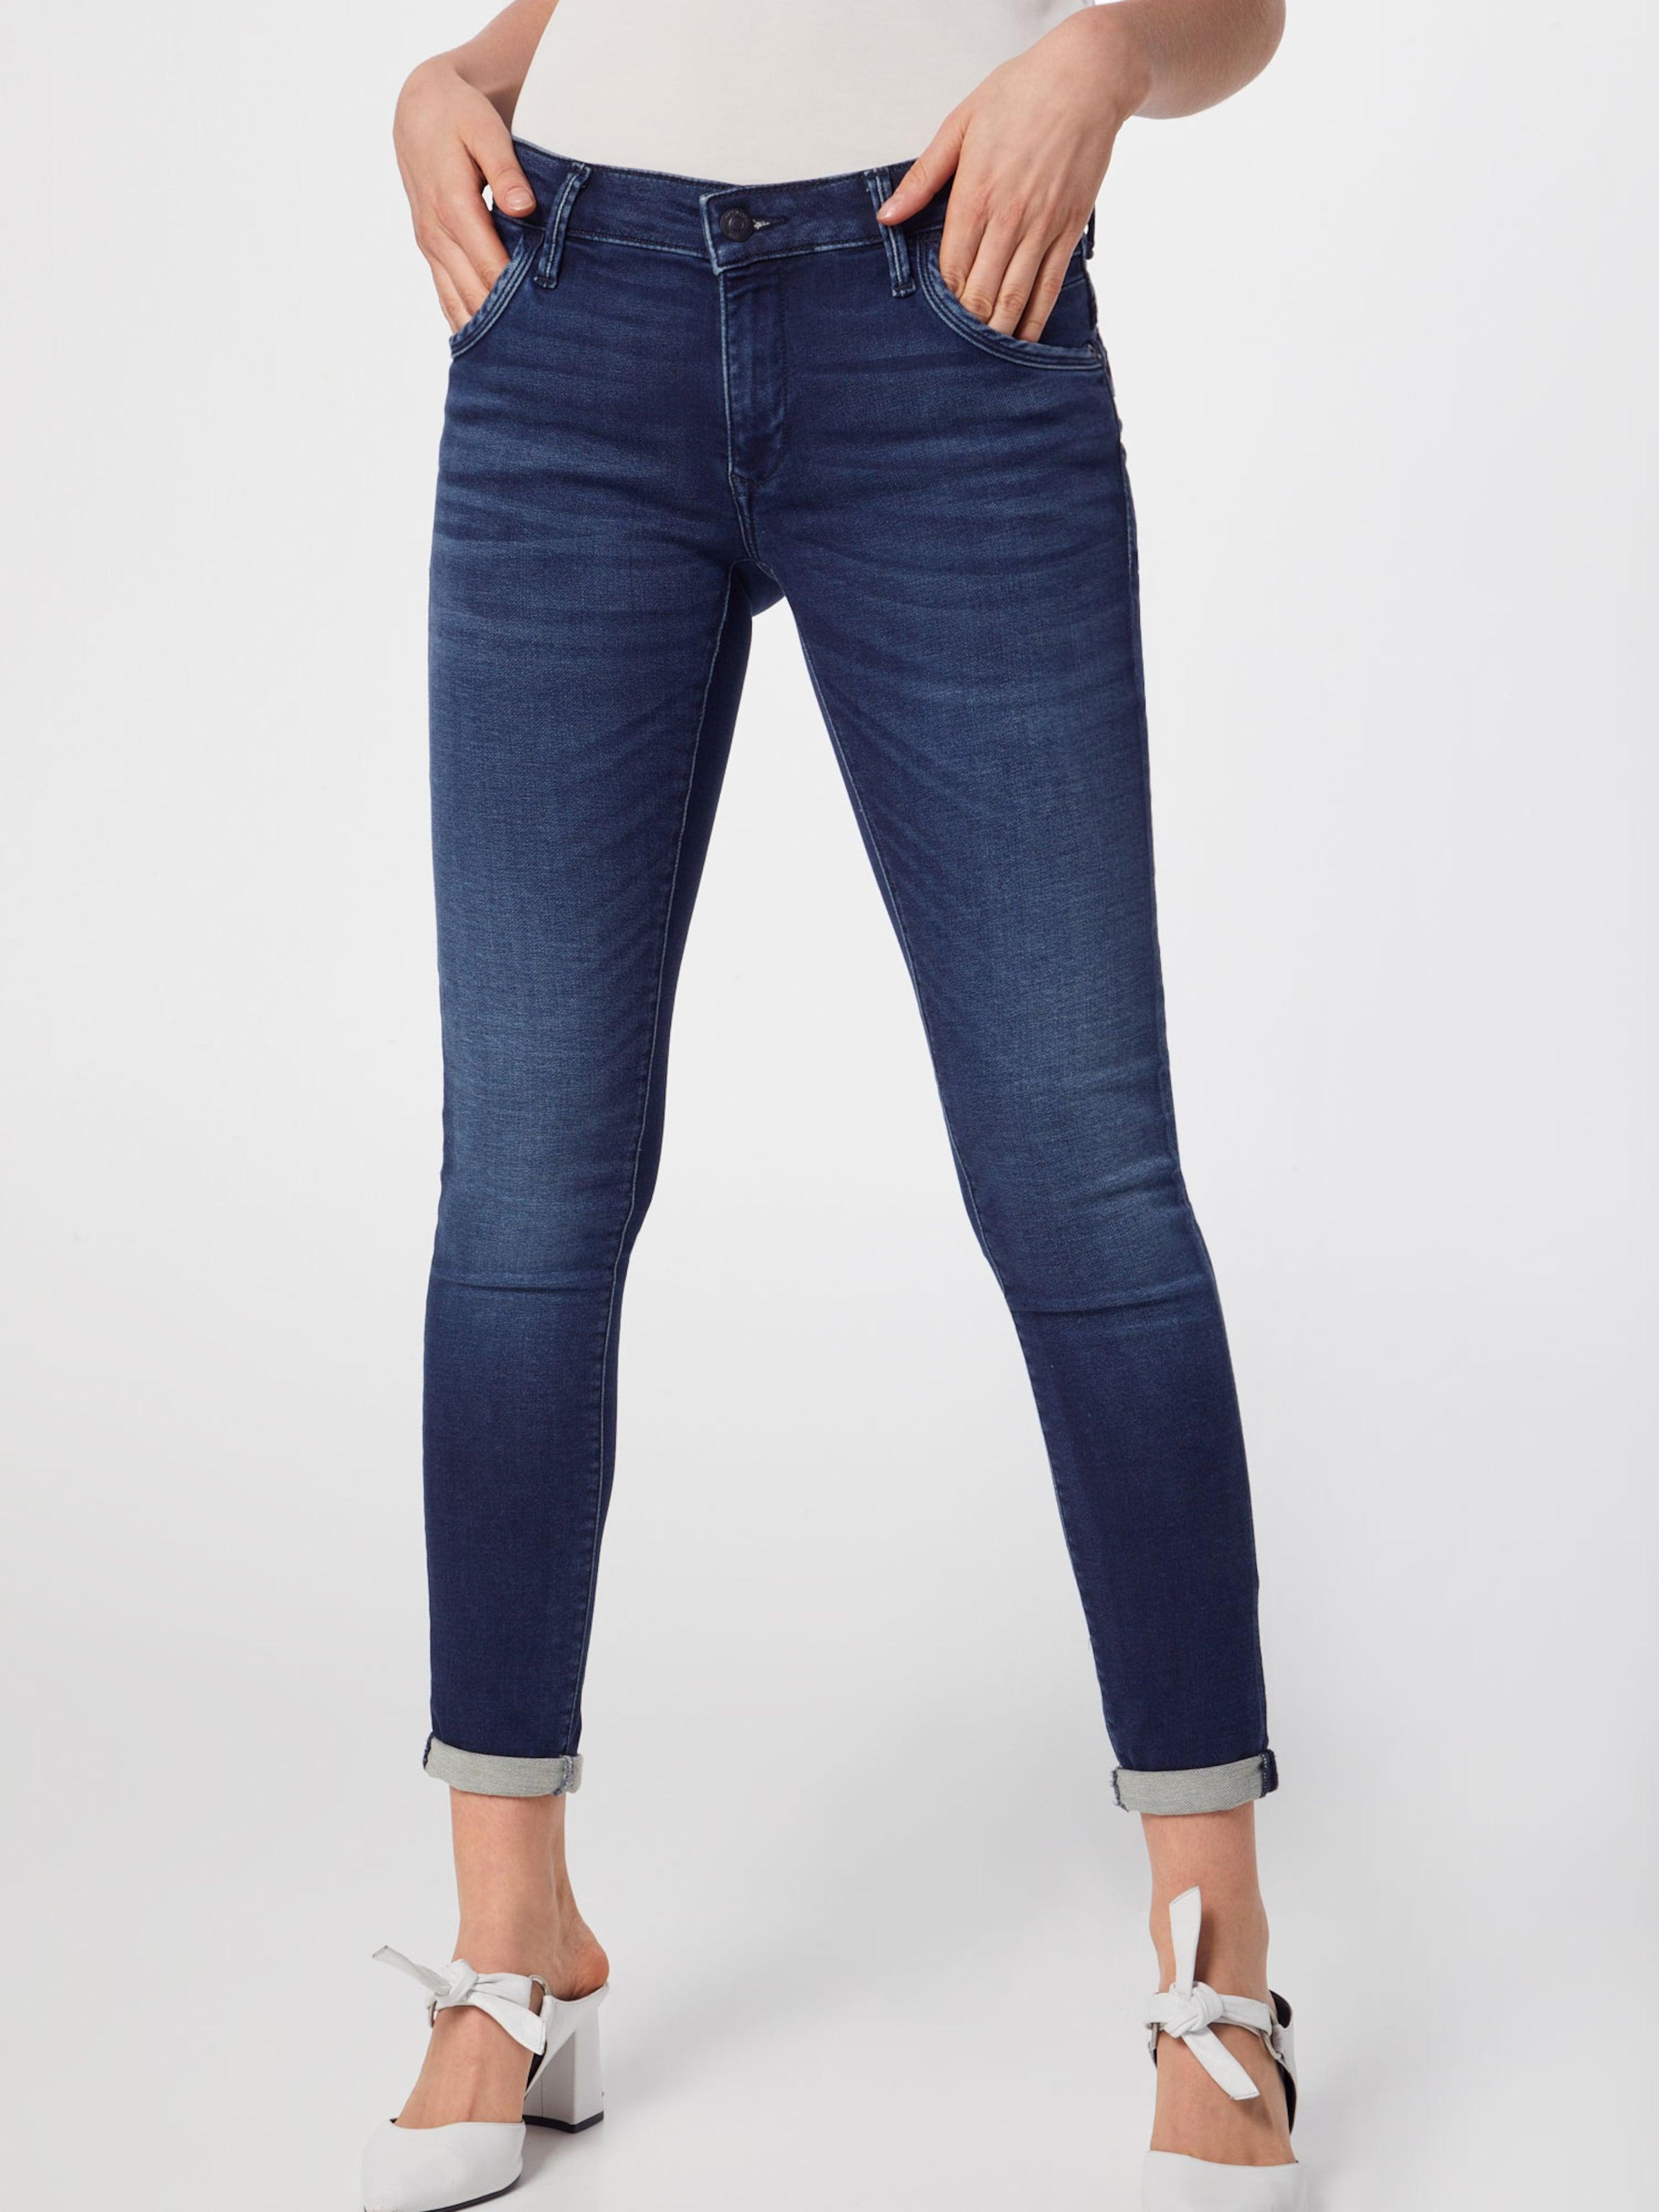 In Jeans Dunkelblau Mavi 'lexy' Mavi 'lexy' Jeans nwO0k8P